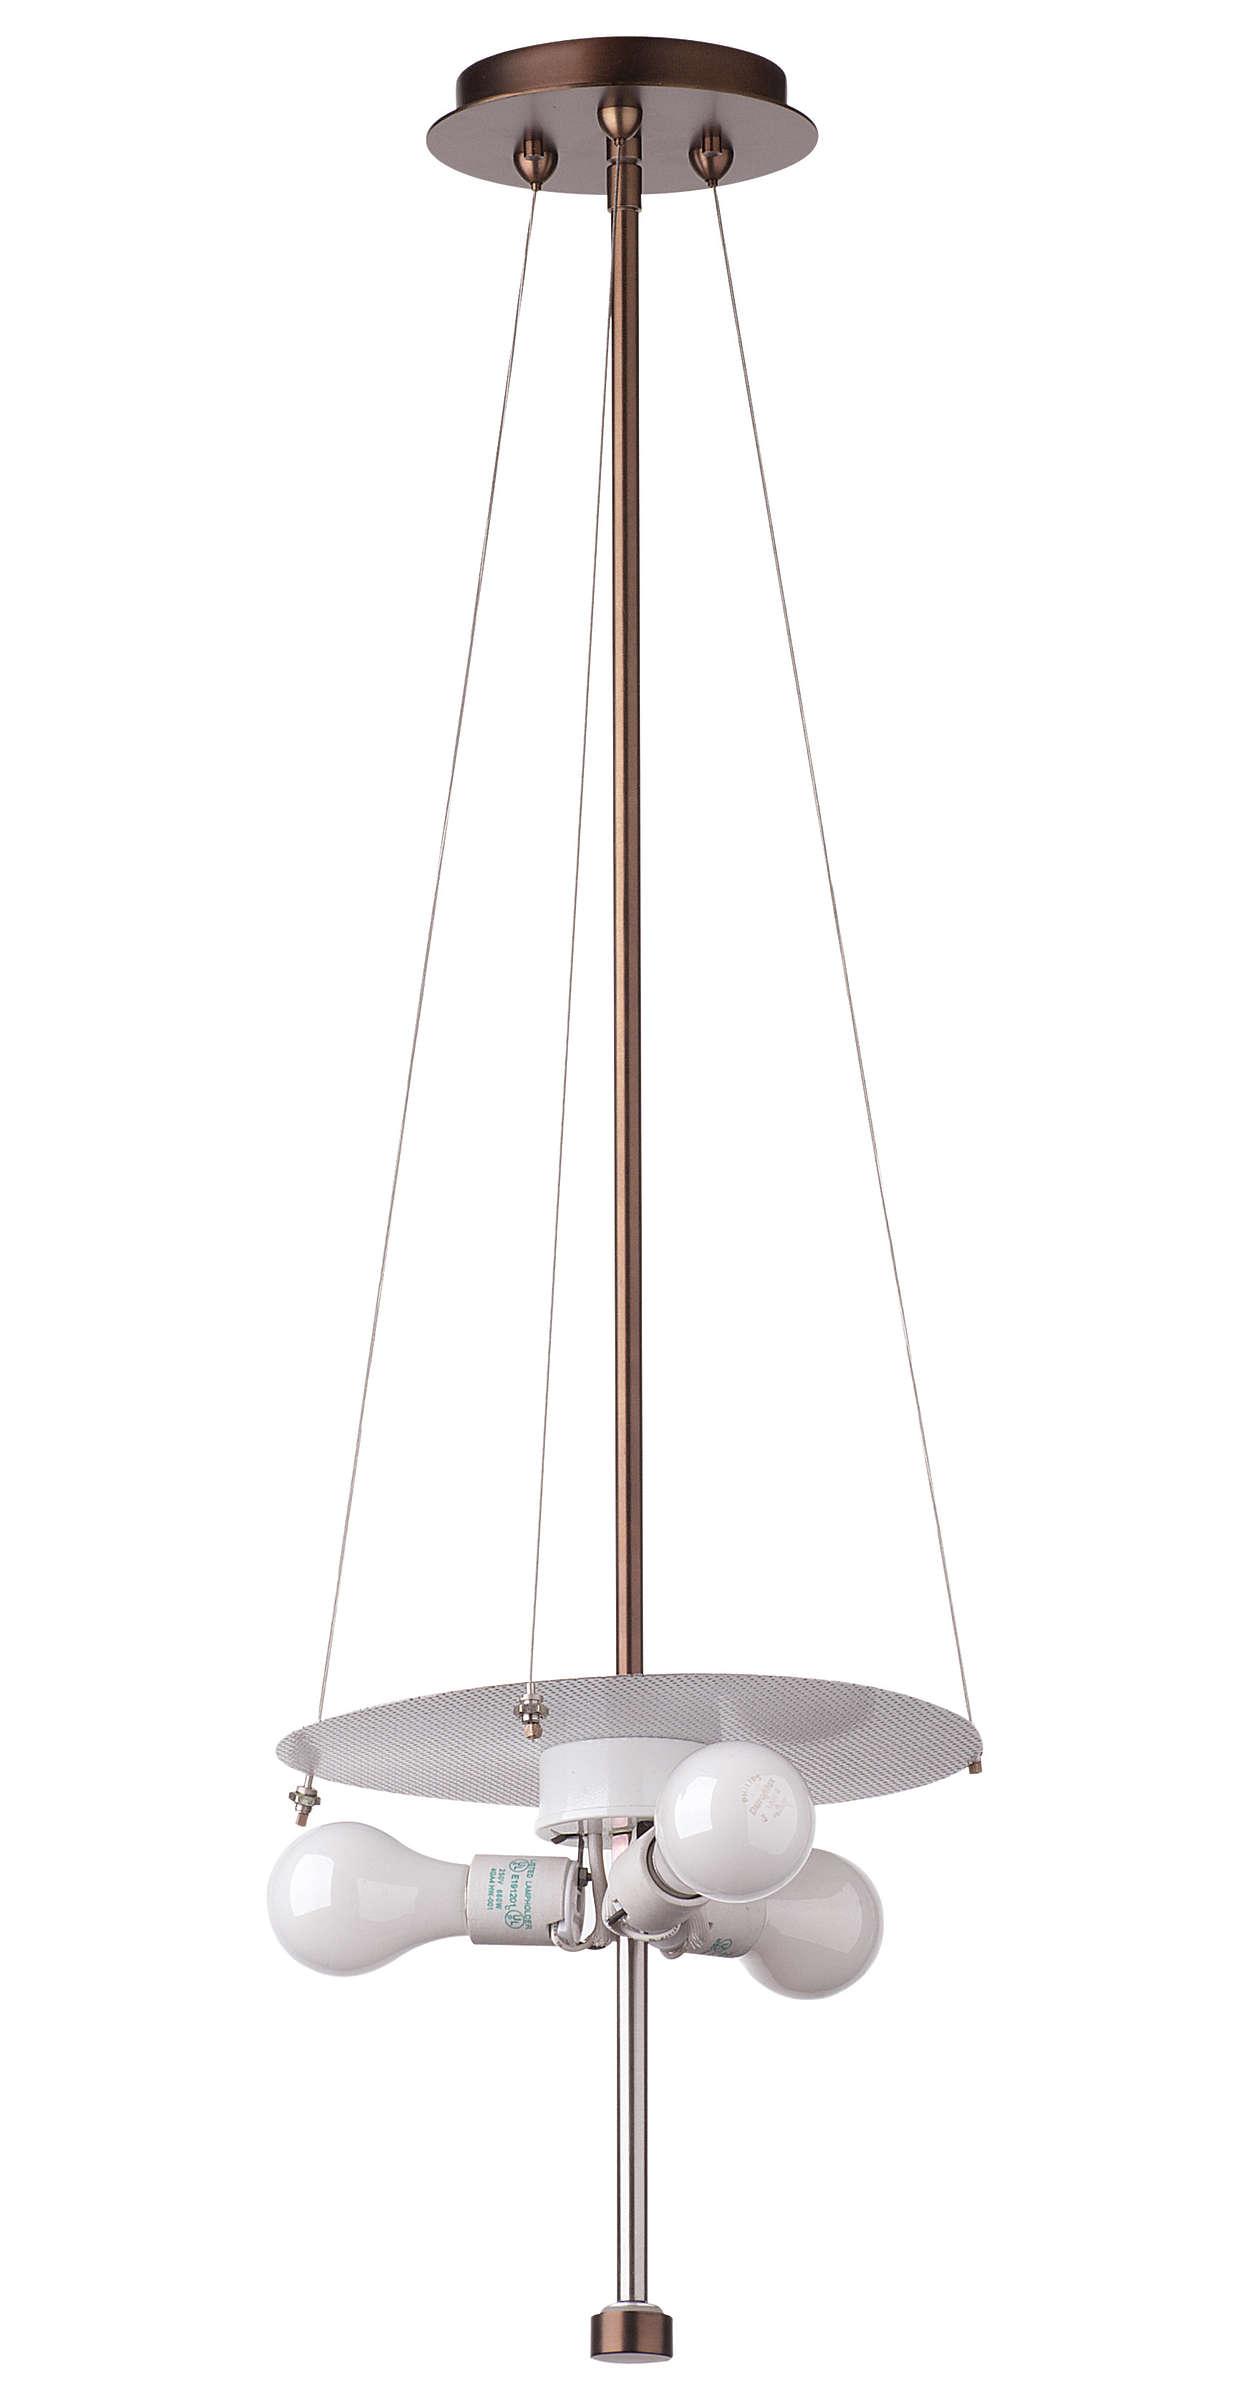 Taylor 3-light Pendant in Merlot Bronze finish